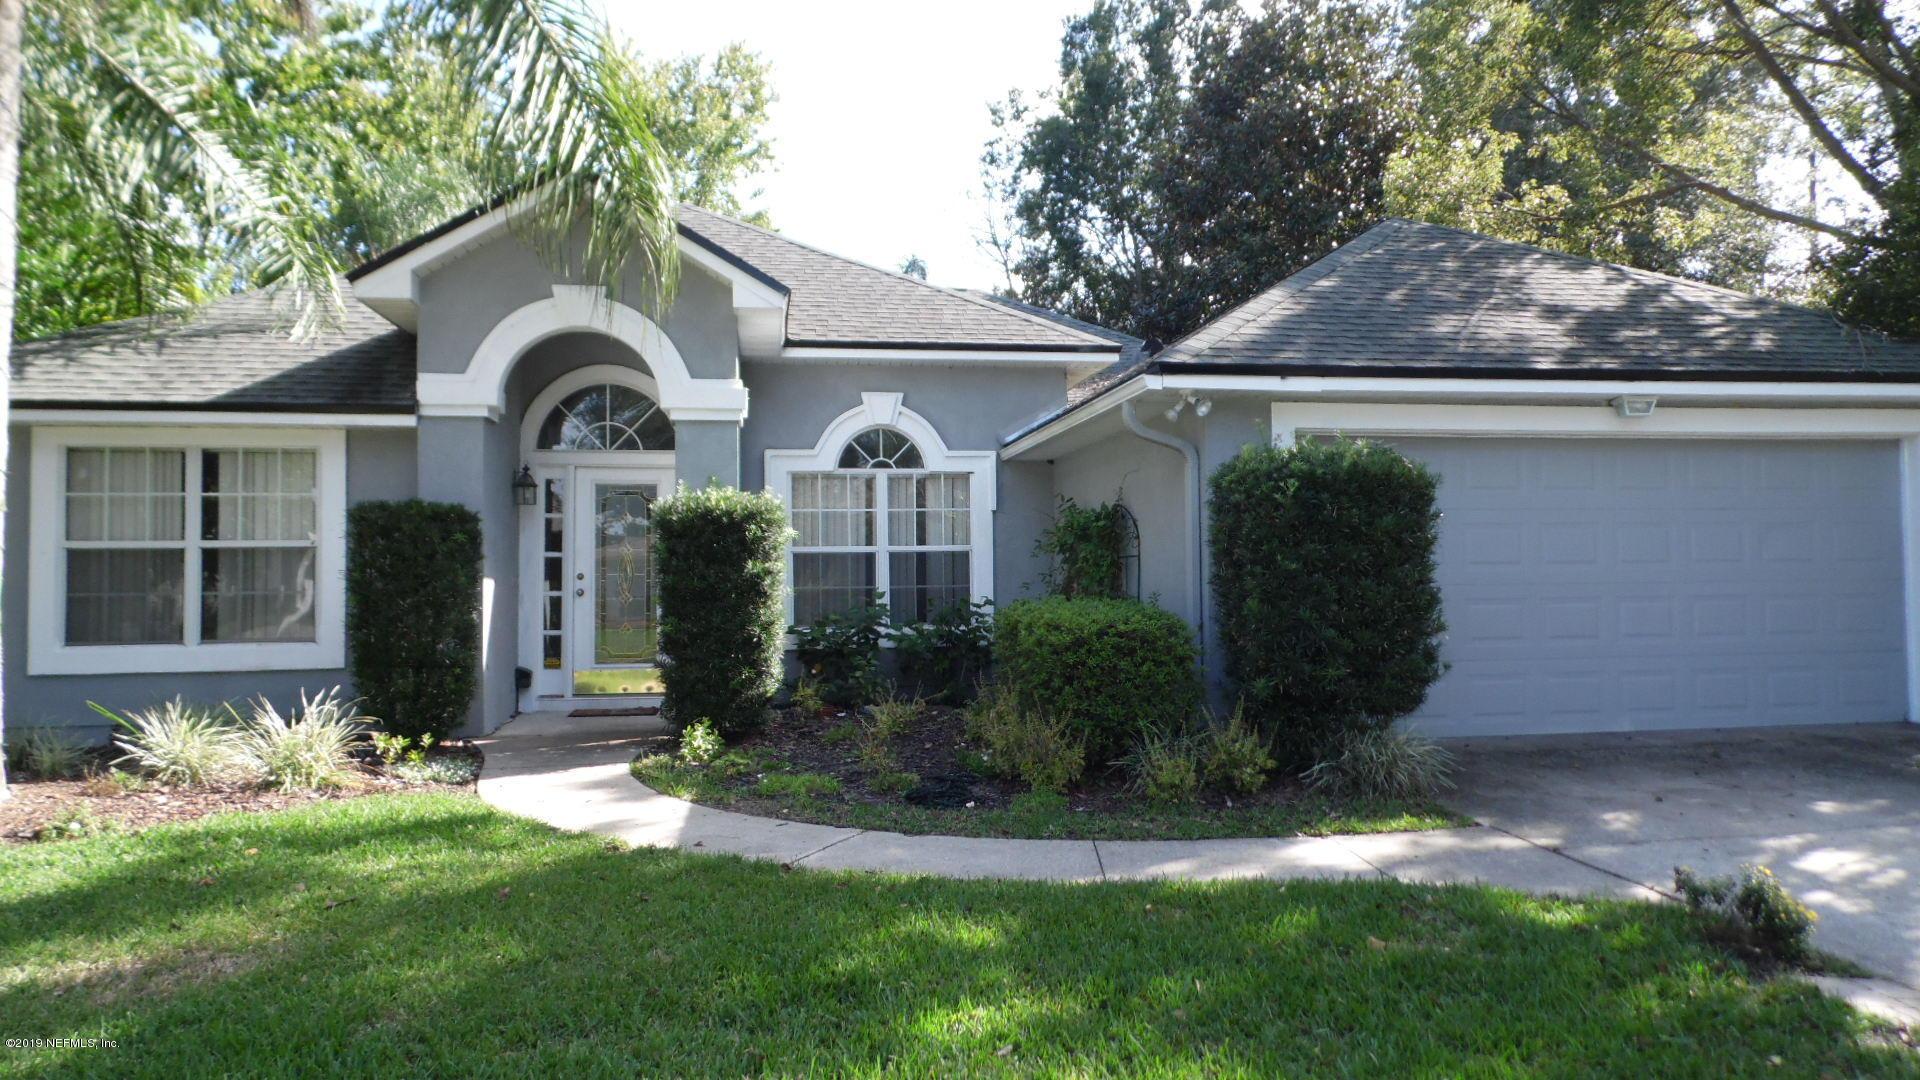 1591 LAKEWAY, ORANGE PARK, FLORIDA 32003, 4 Bedrooms Bedrooms, ,2 BathroomsBathrooms,Rental,For sale,LAKEWAY,1023119